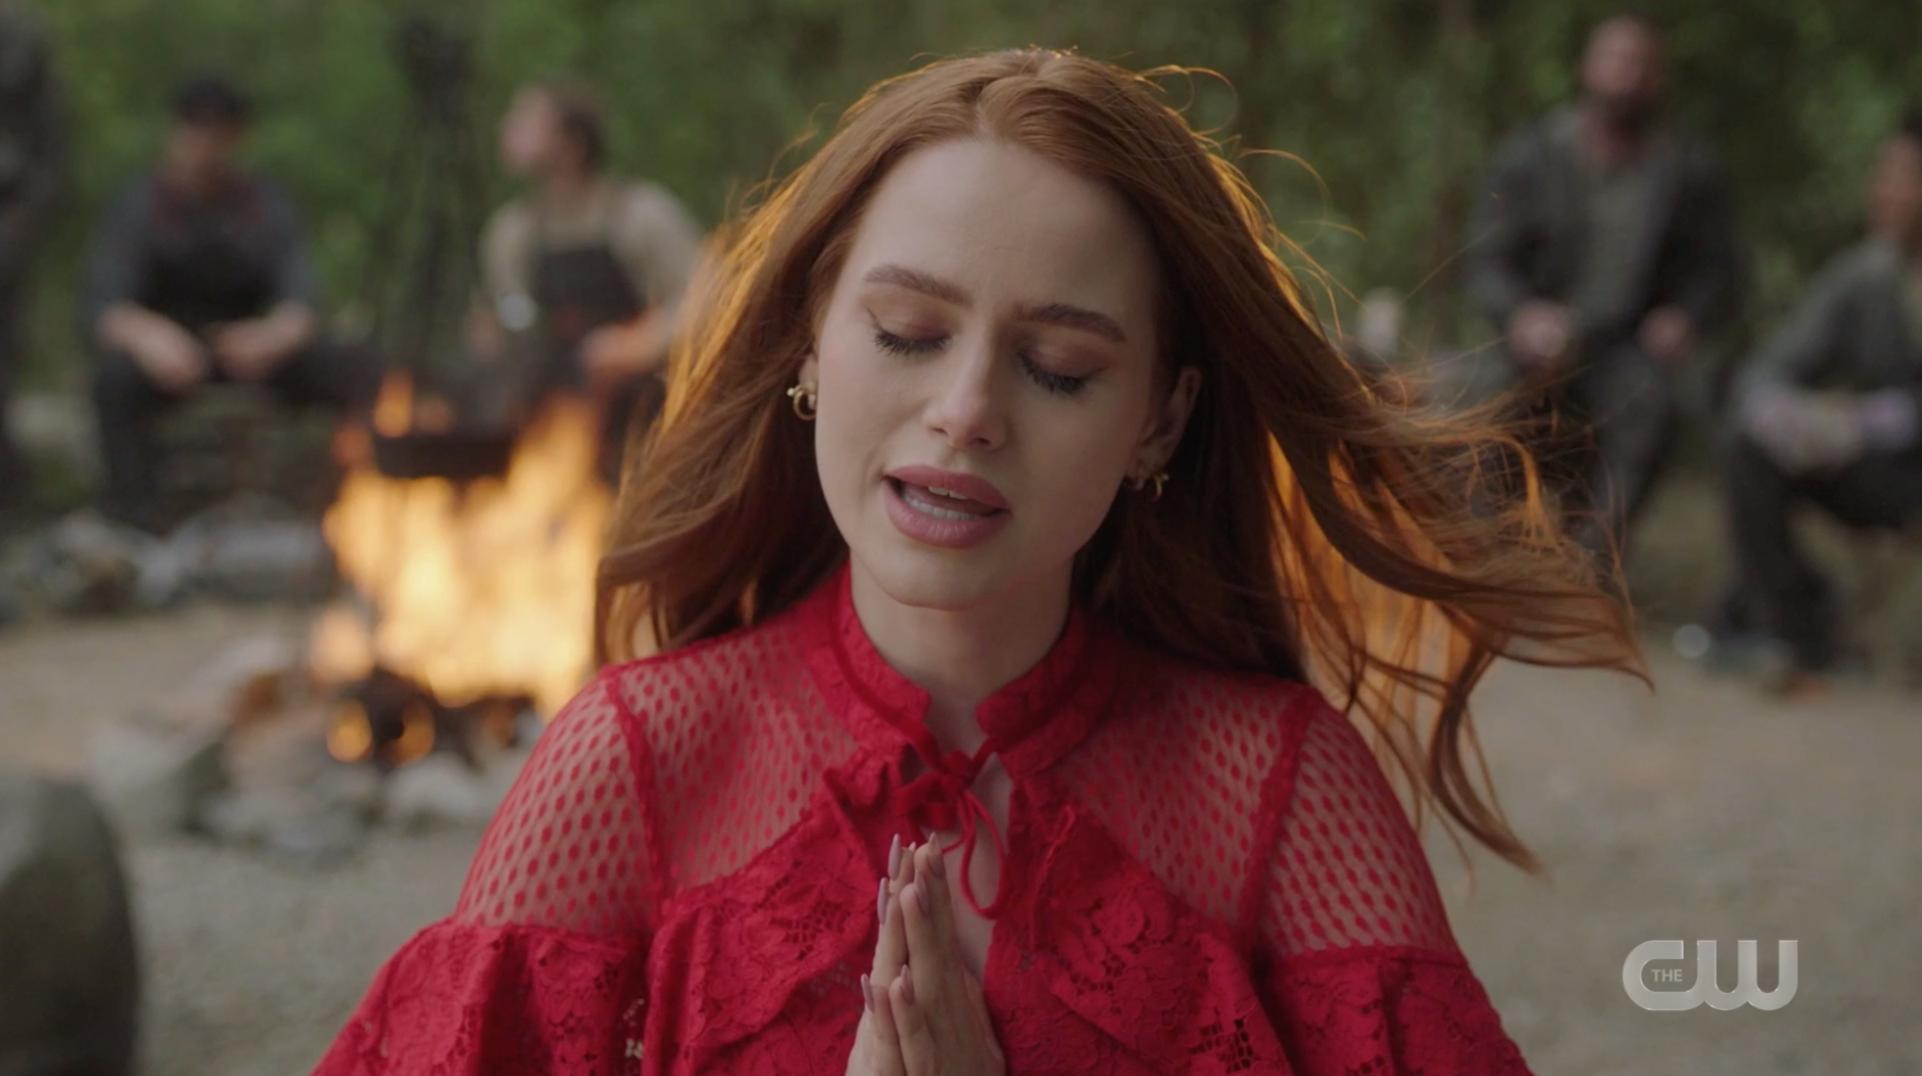 Cheryl praying